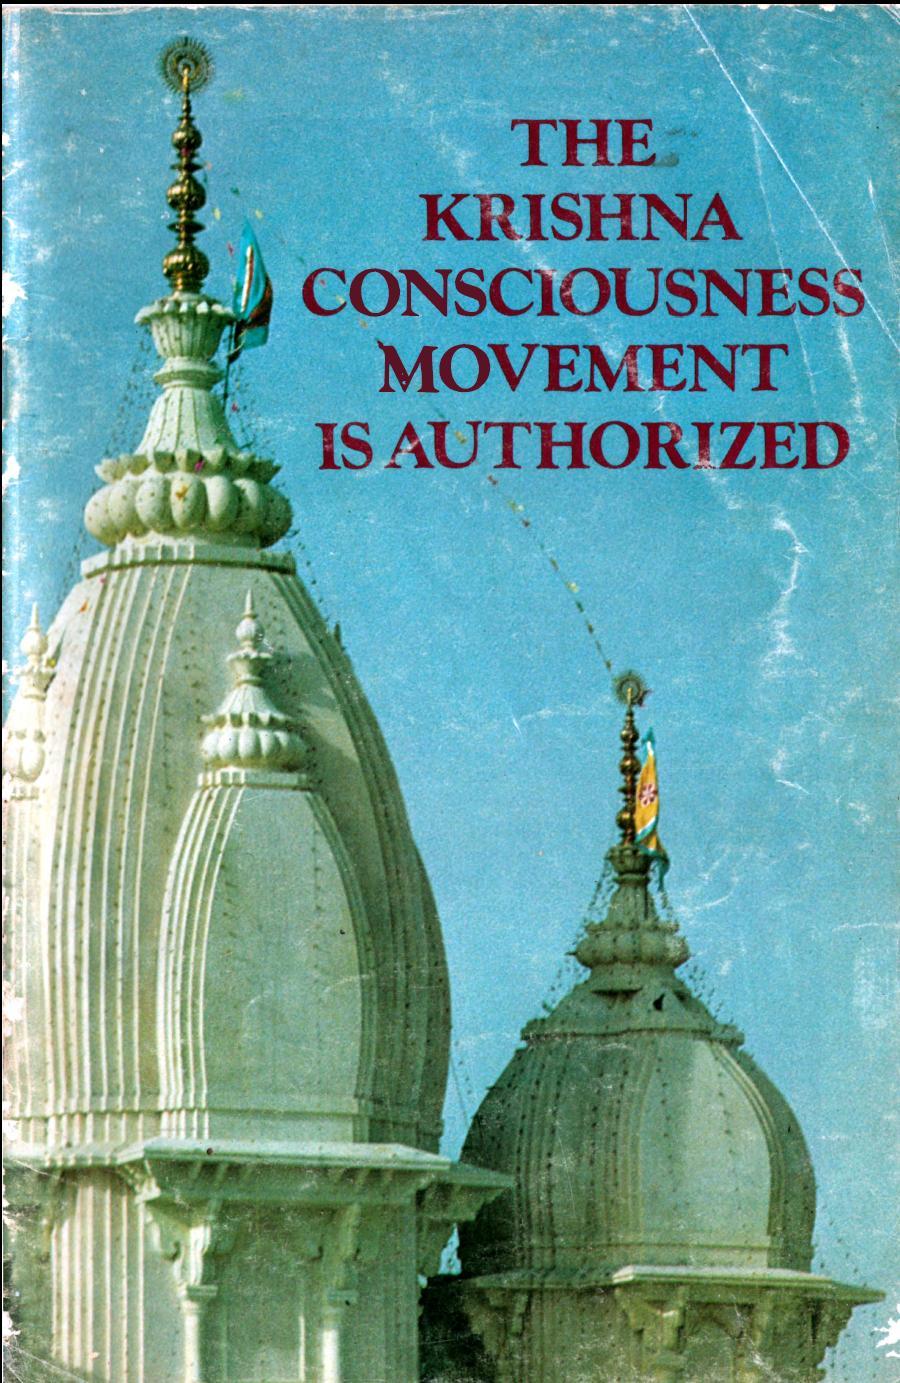 The Krishna Consciousness Movement